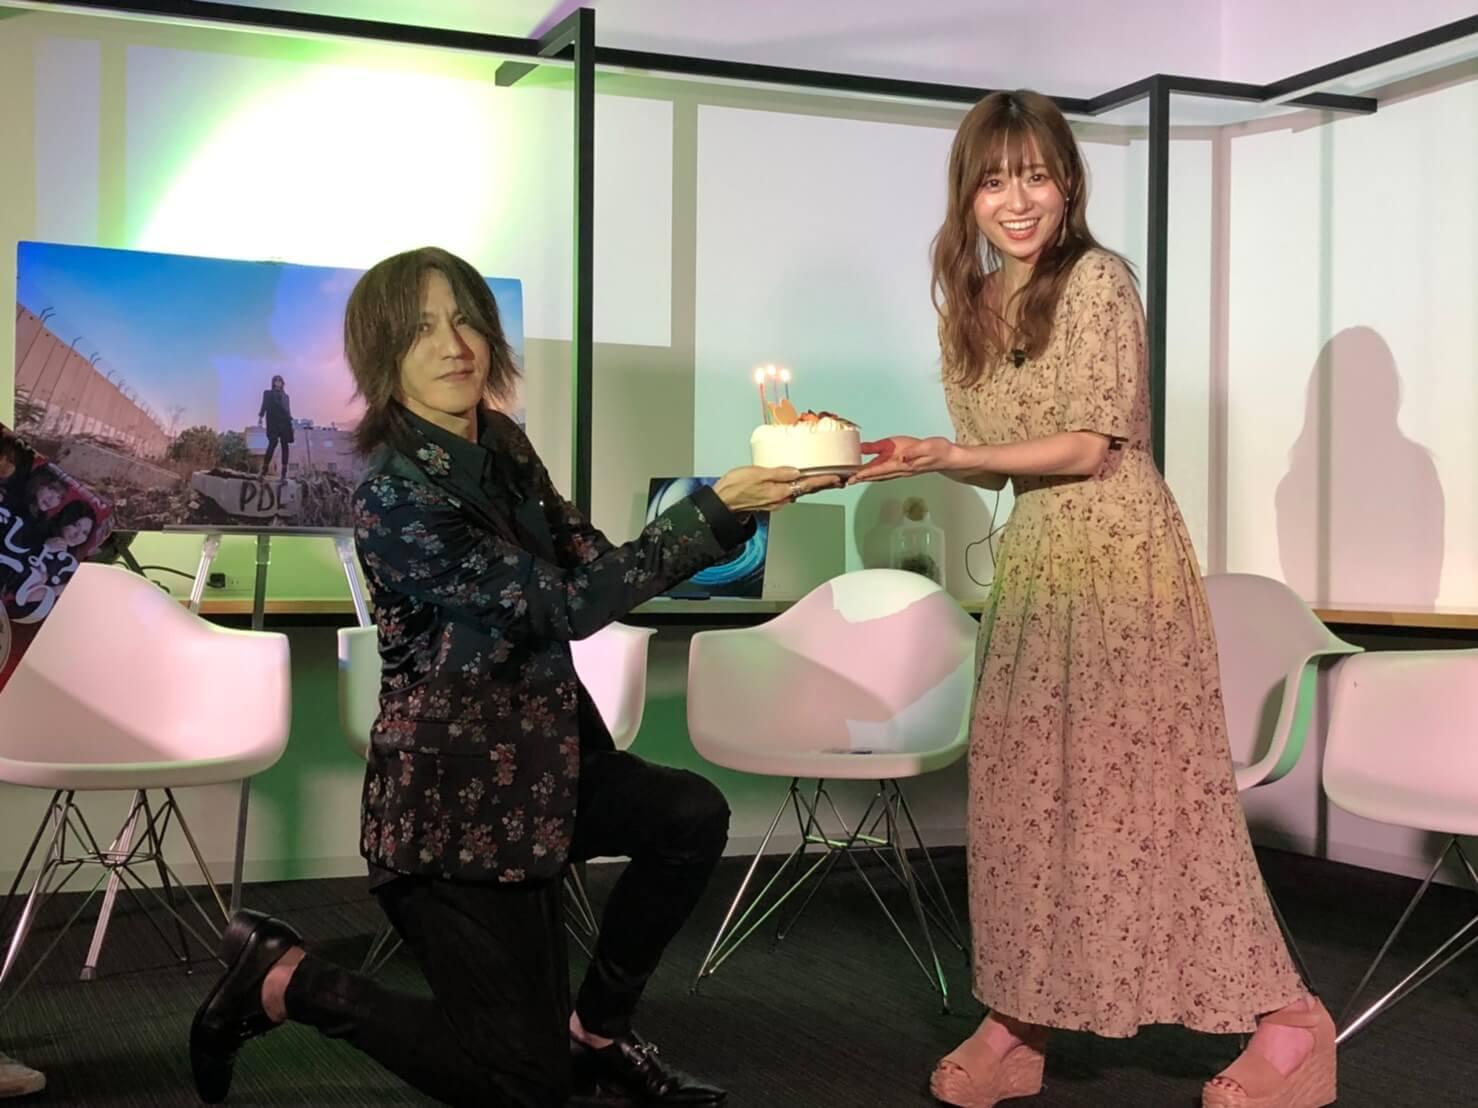 SILENT SIREN、LUNA SEA/X JAPANのSUGIZOとSugizoTubeで初共演&ゆかるんがSUGIZOからサプライズバースデーでお祝いサムネイル画像